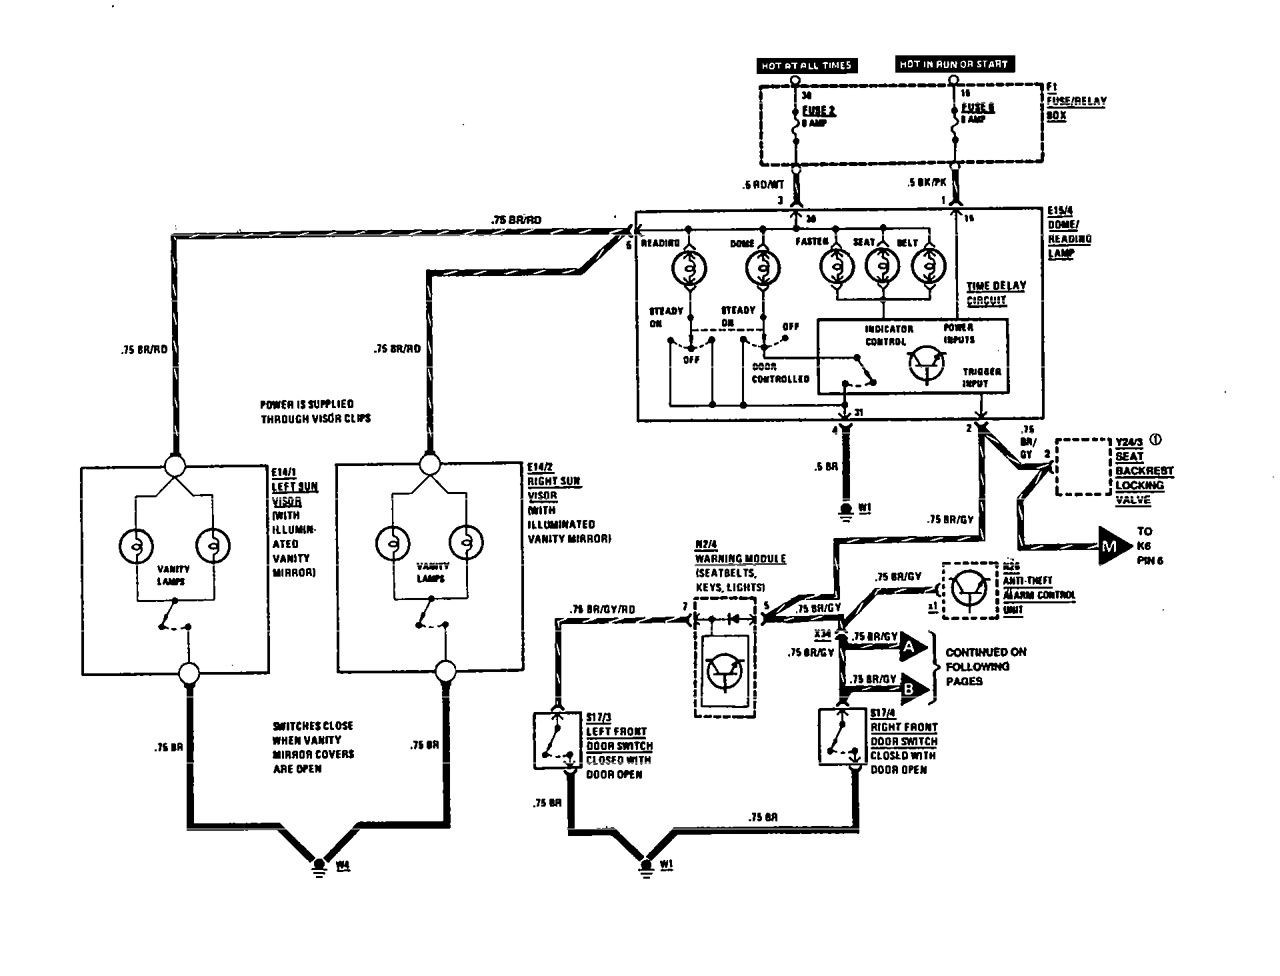 Mercedes Benz 560sel 1991 Wiring Diagrams Courtesy Lamps Fuse Box Diagram 300se Part 1